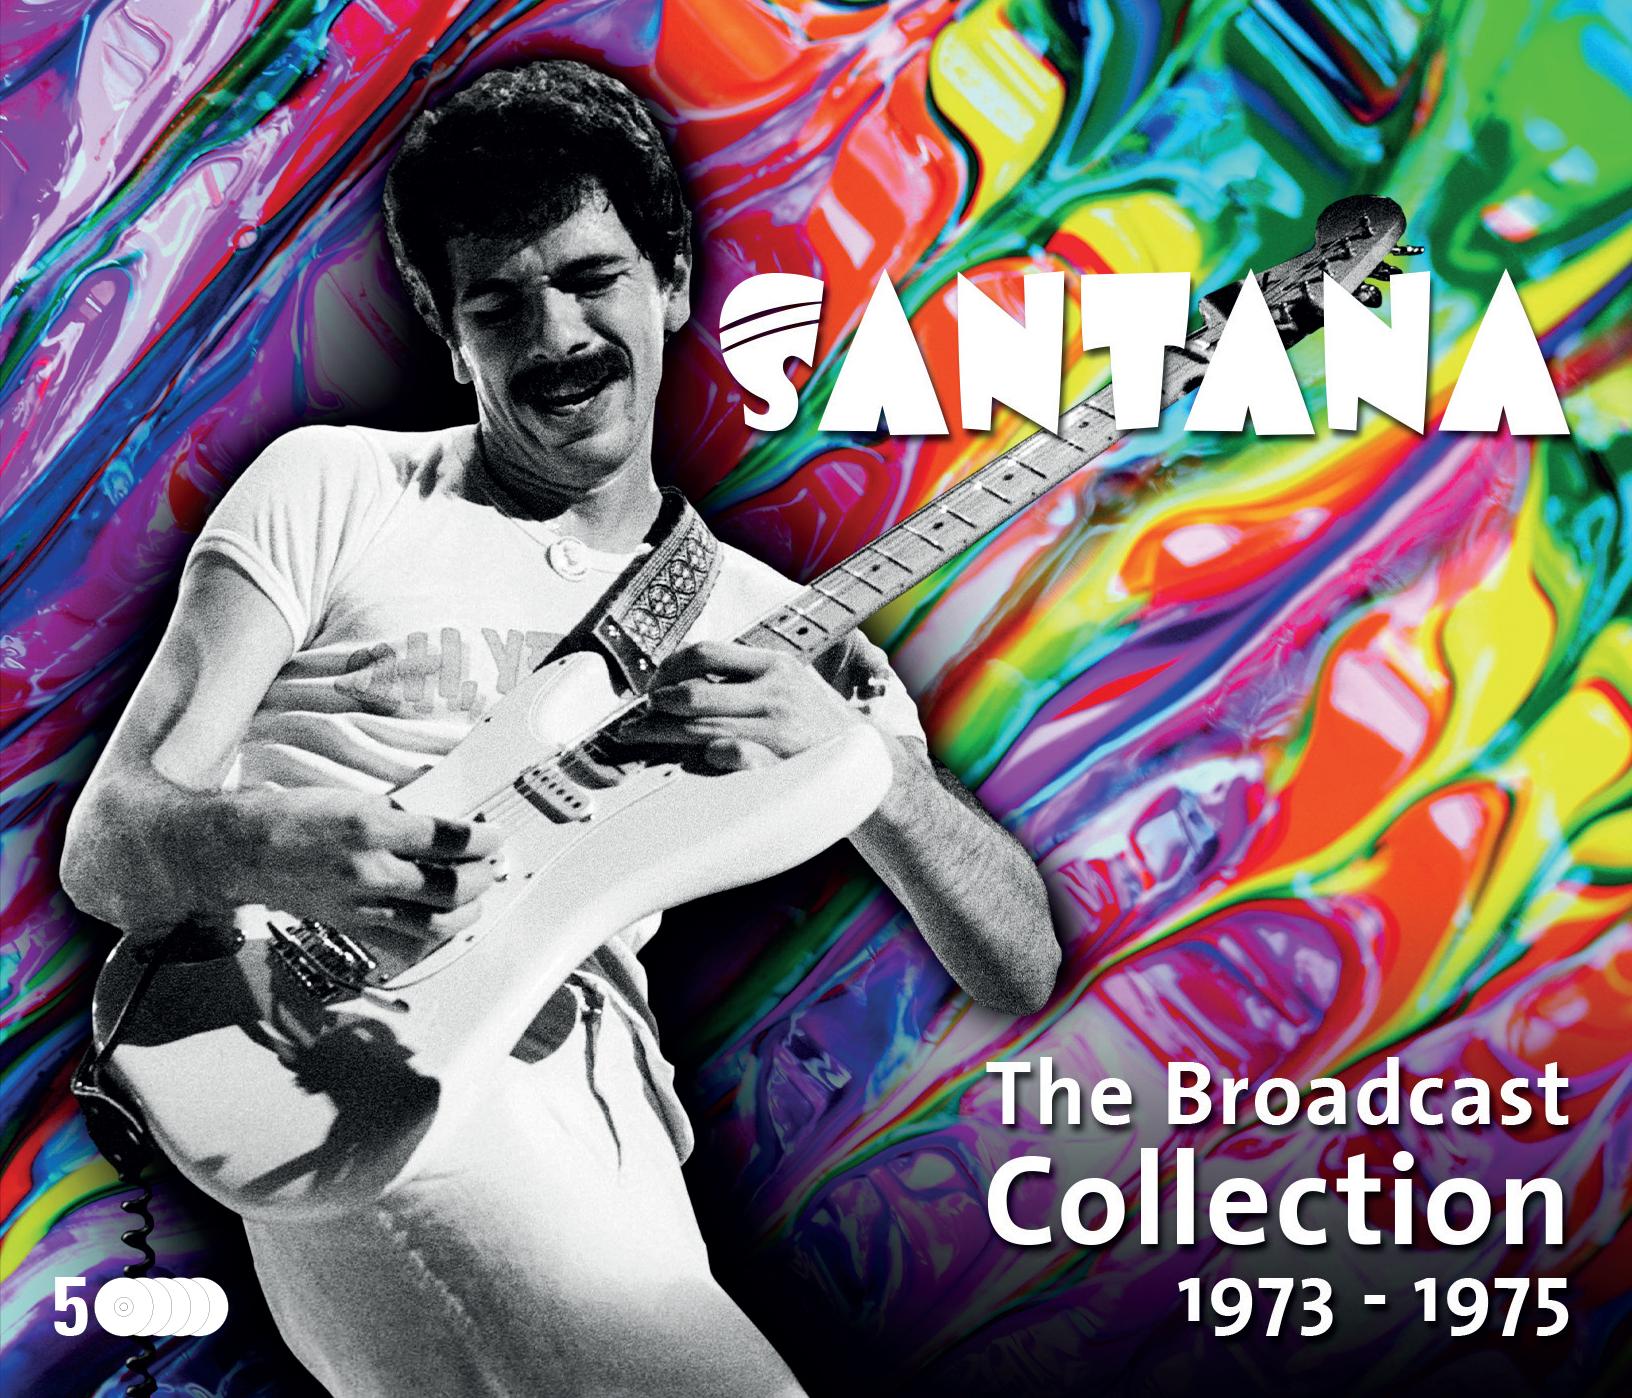 Santana - The Broadcast Collection 1973-1975 - CD - Inlay